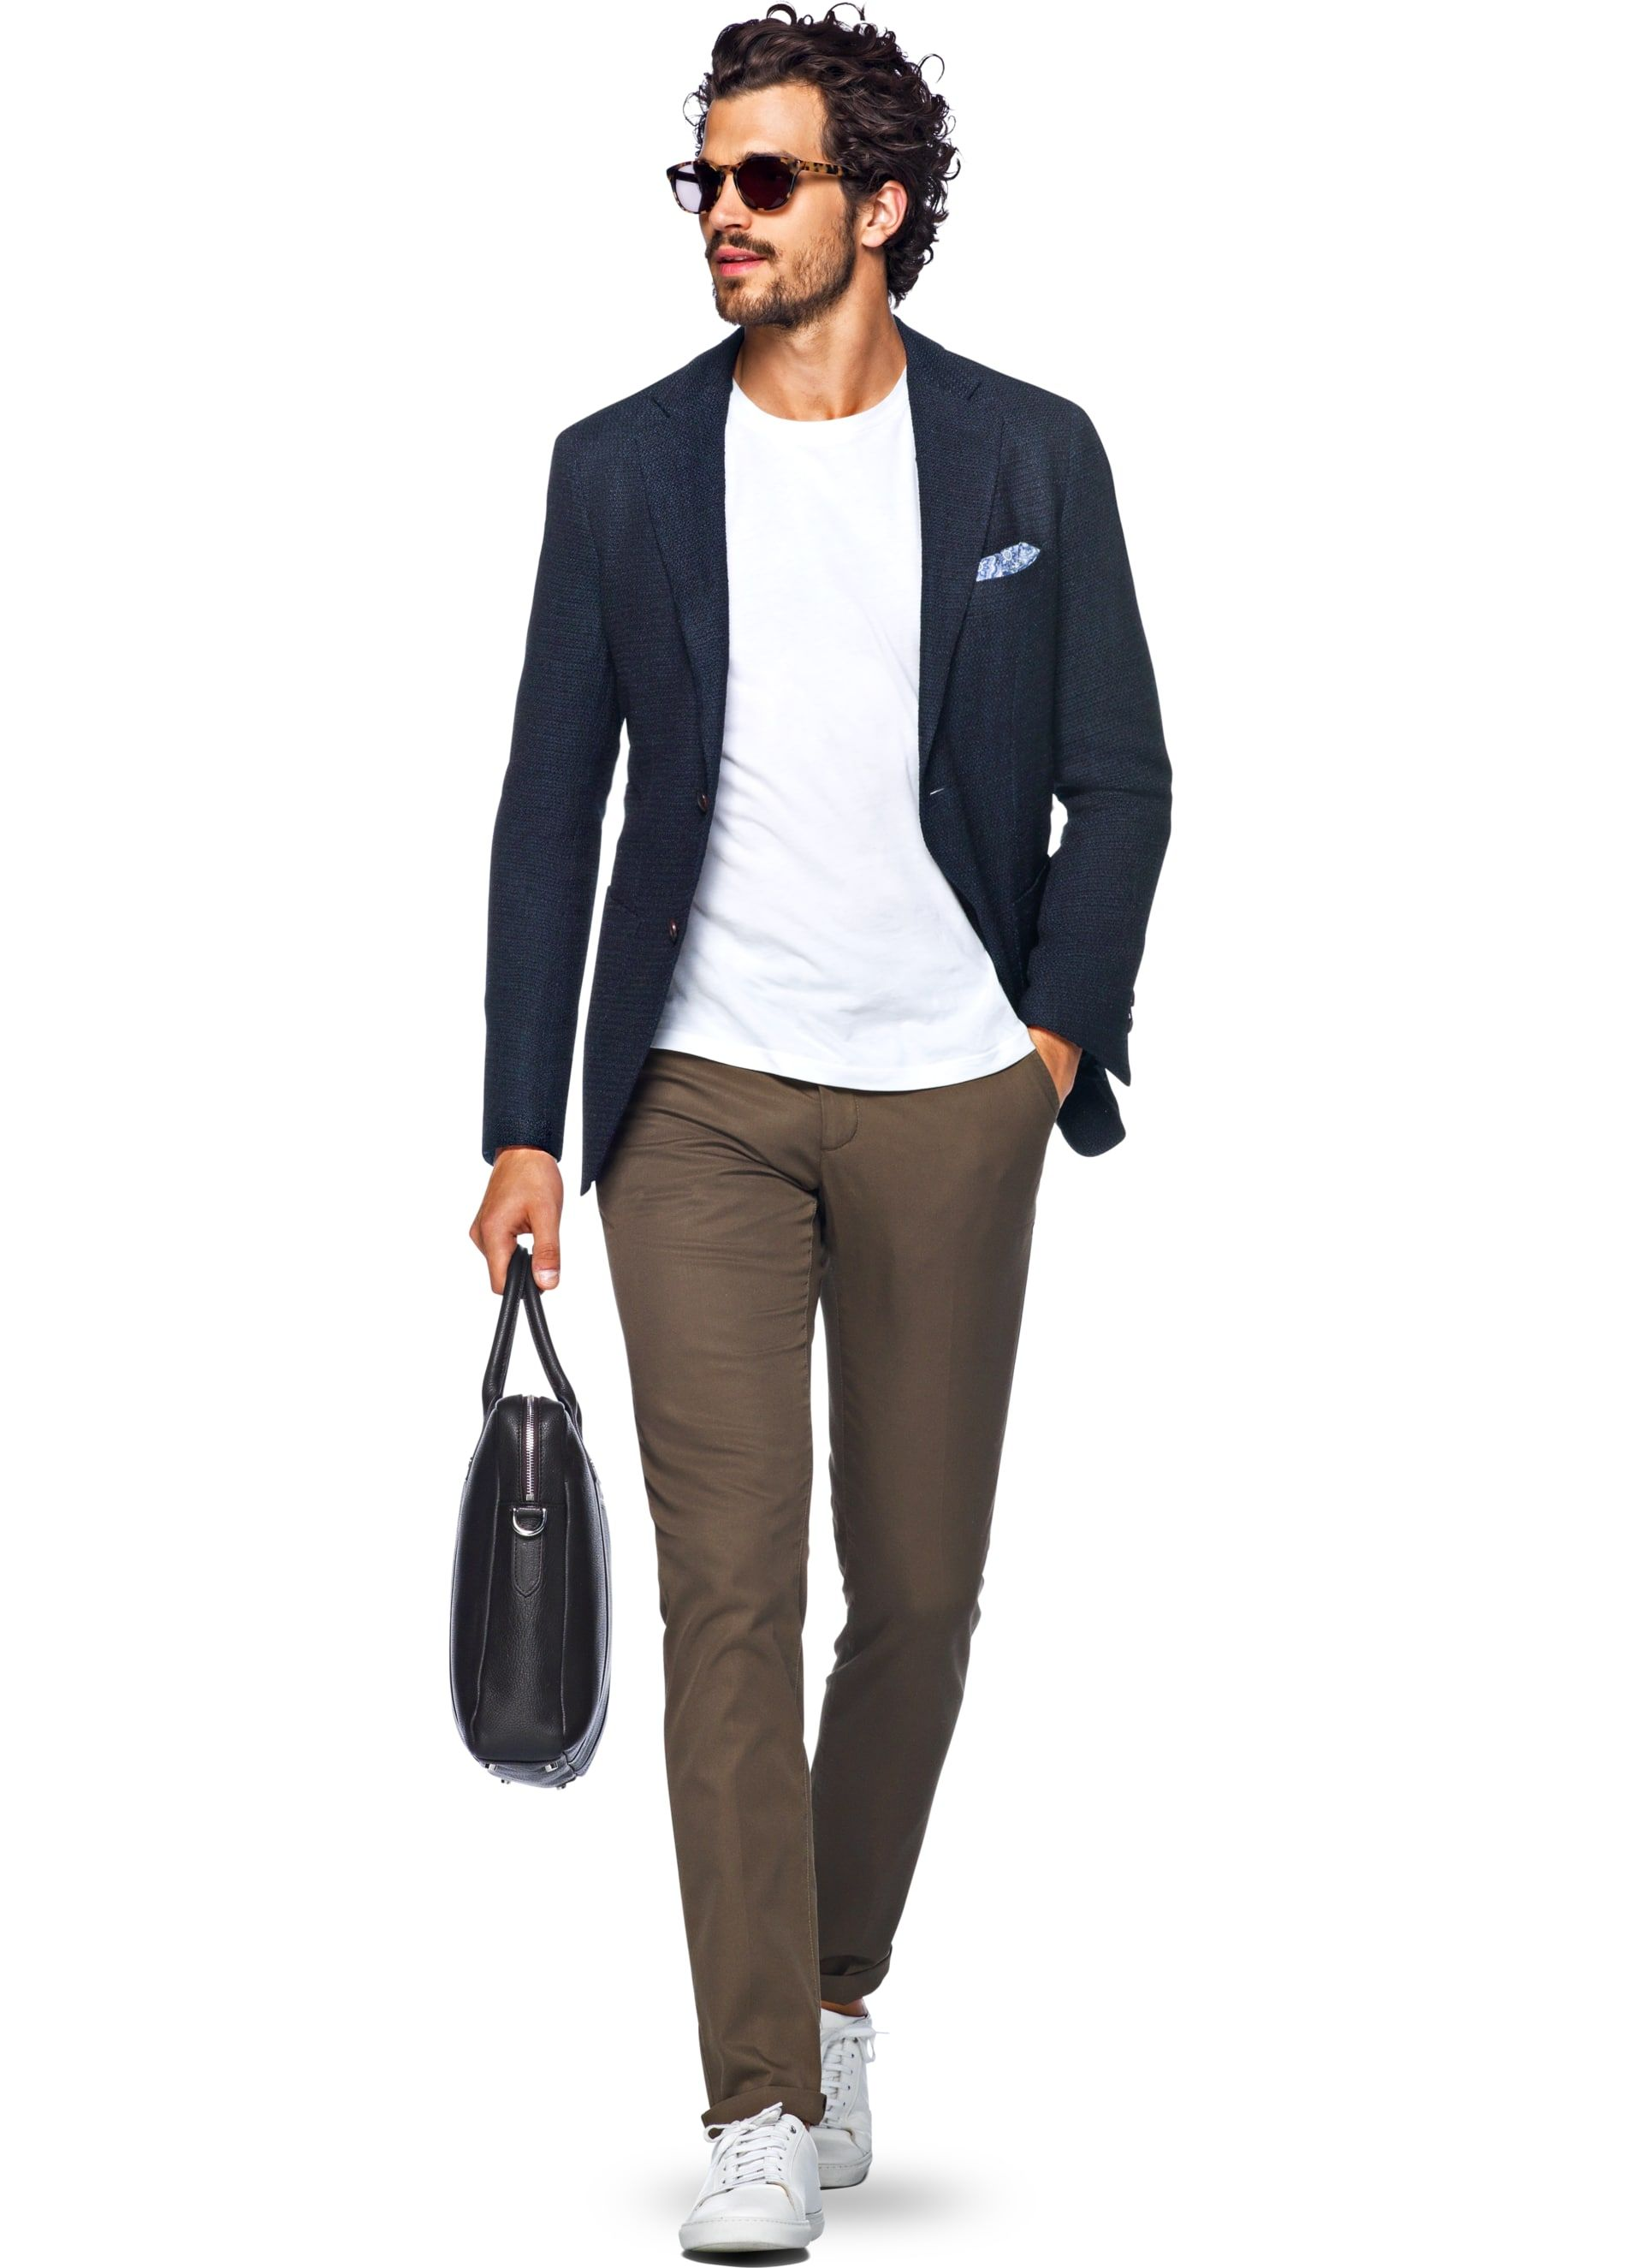 Jacket Navy Plain Havana C962i Suitsupply Online Store Clothes